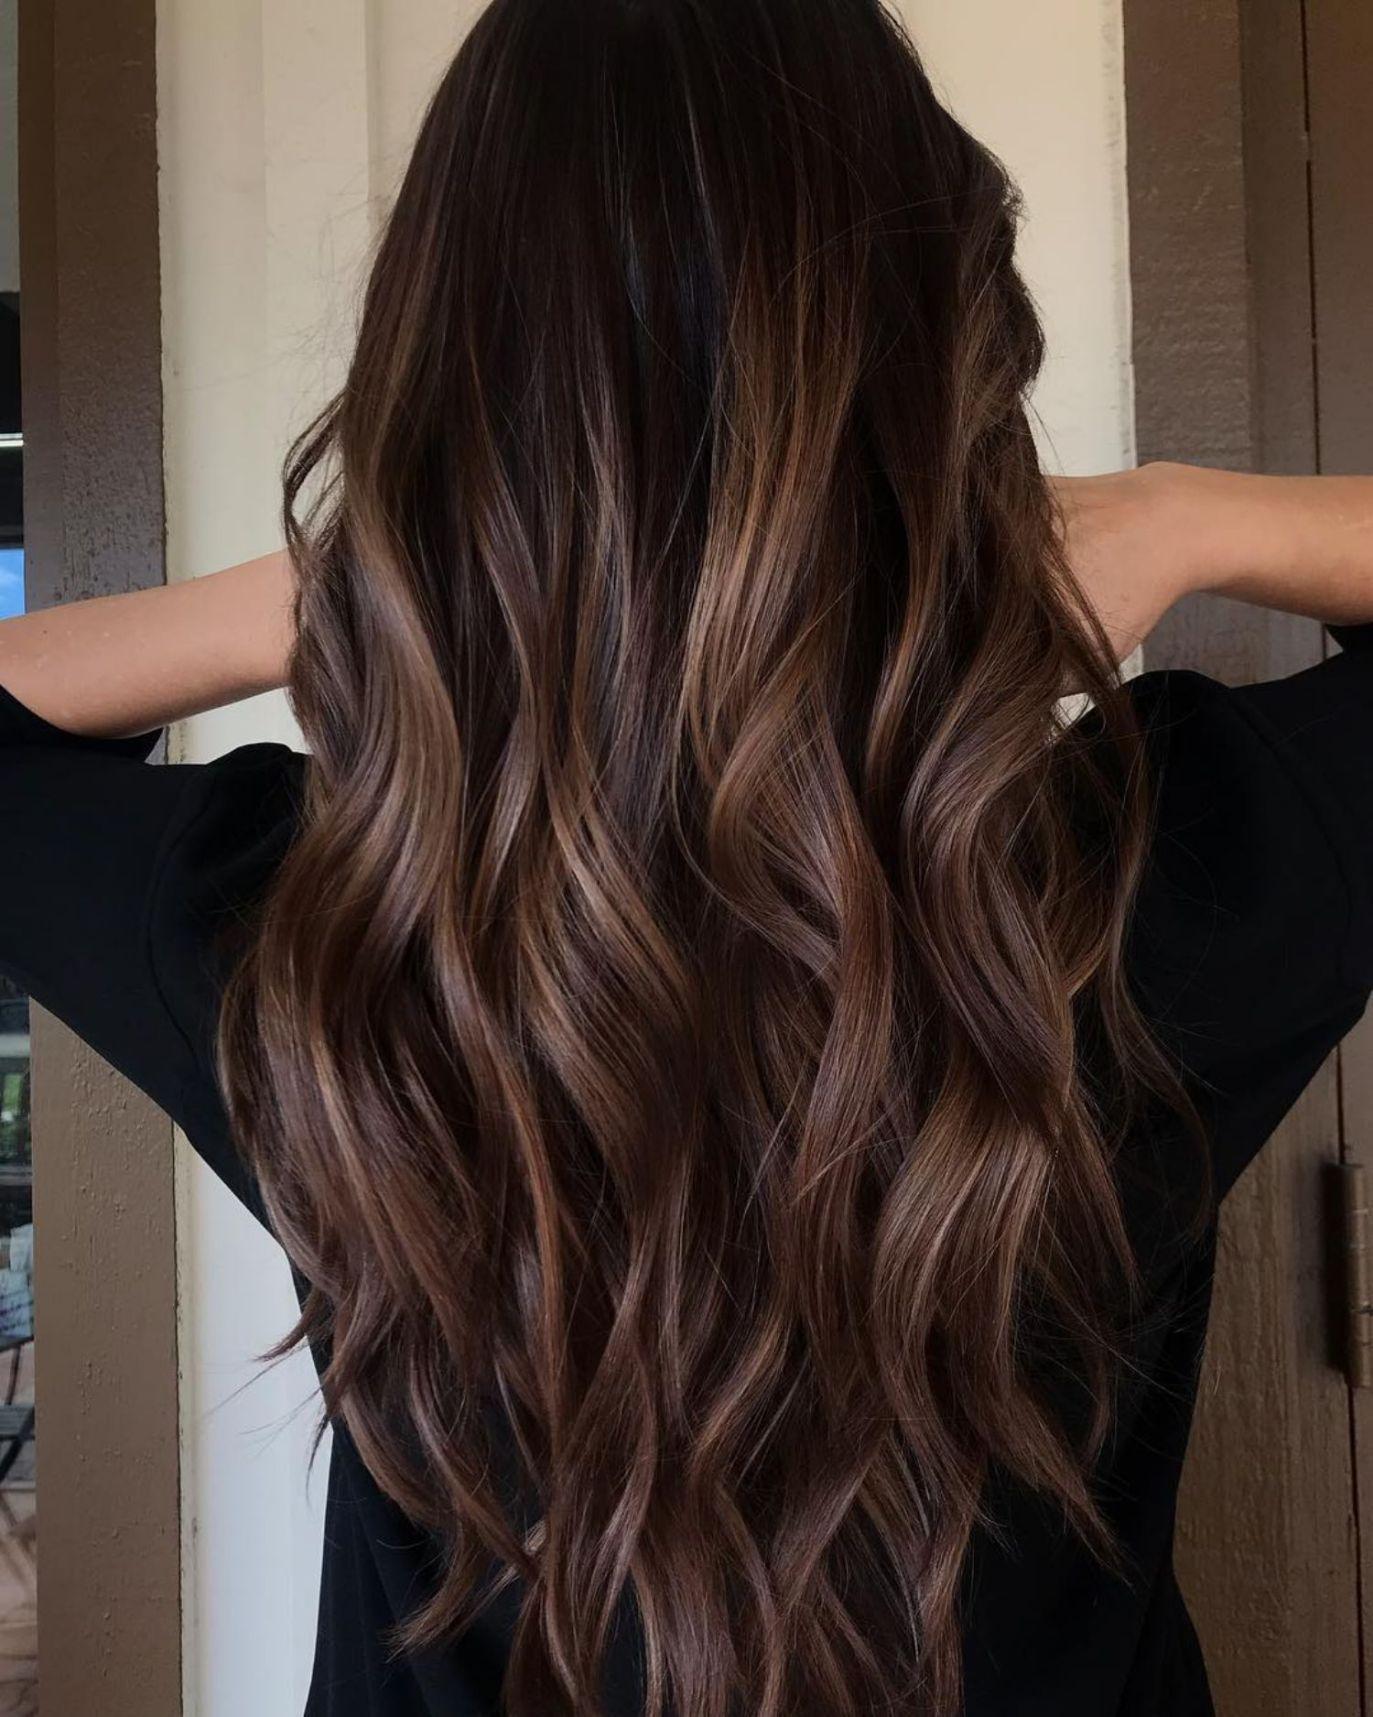 Long Wavy Chocolate Balayage Hair Long Brunette Hair Brown Blonde Hair Hair Styles